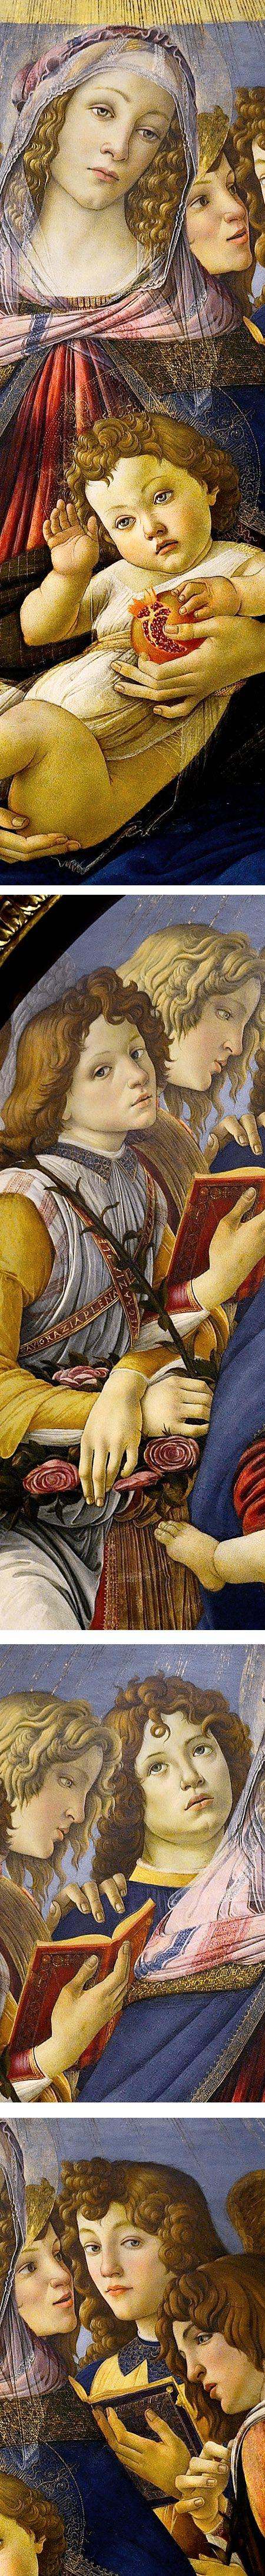 Madonna of the Pomegranate, Sandro Botticelli